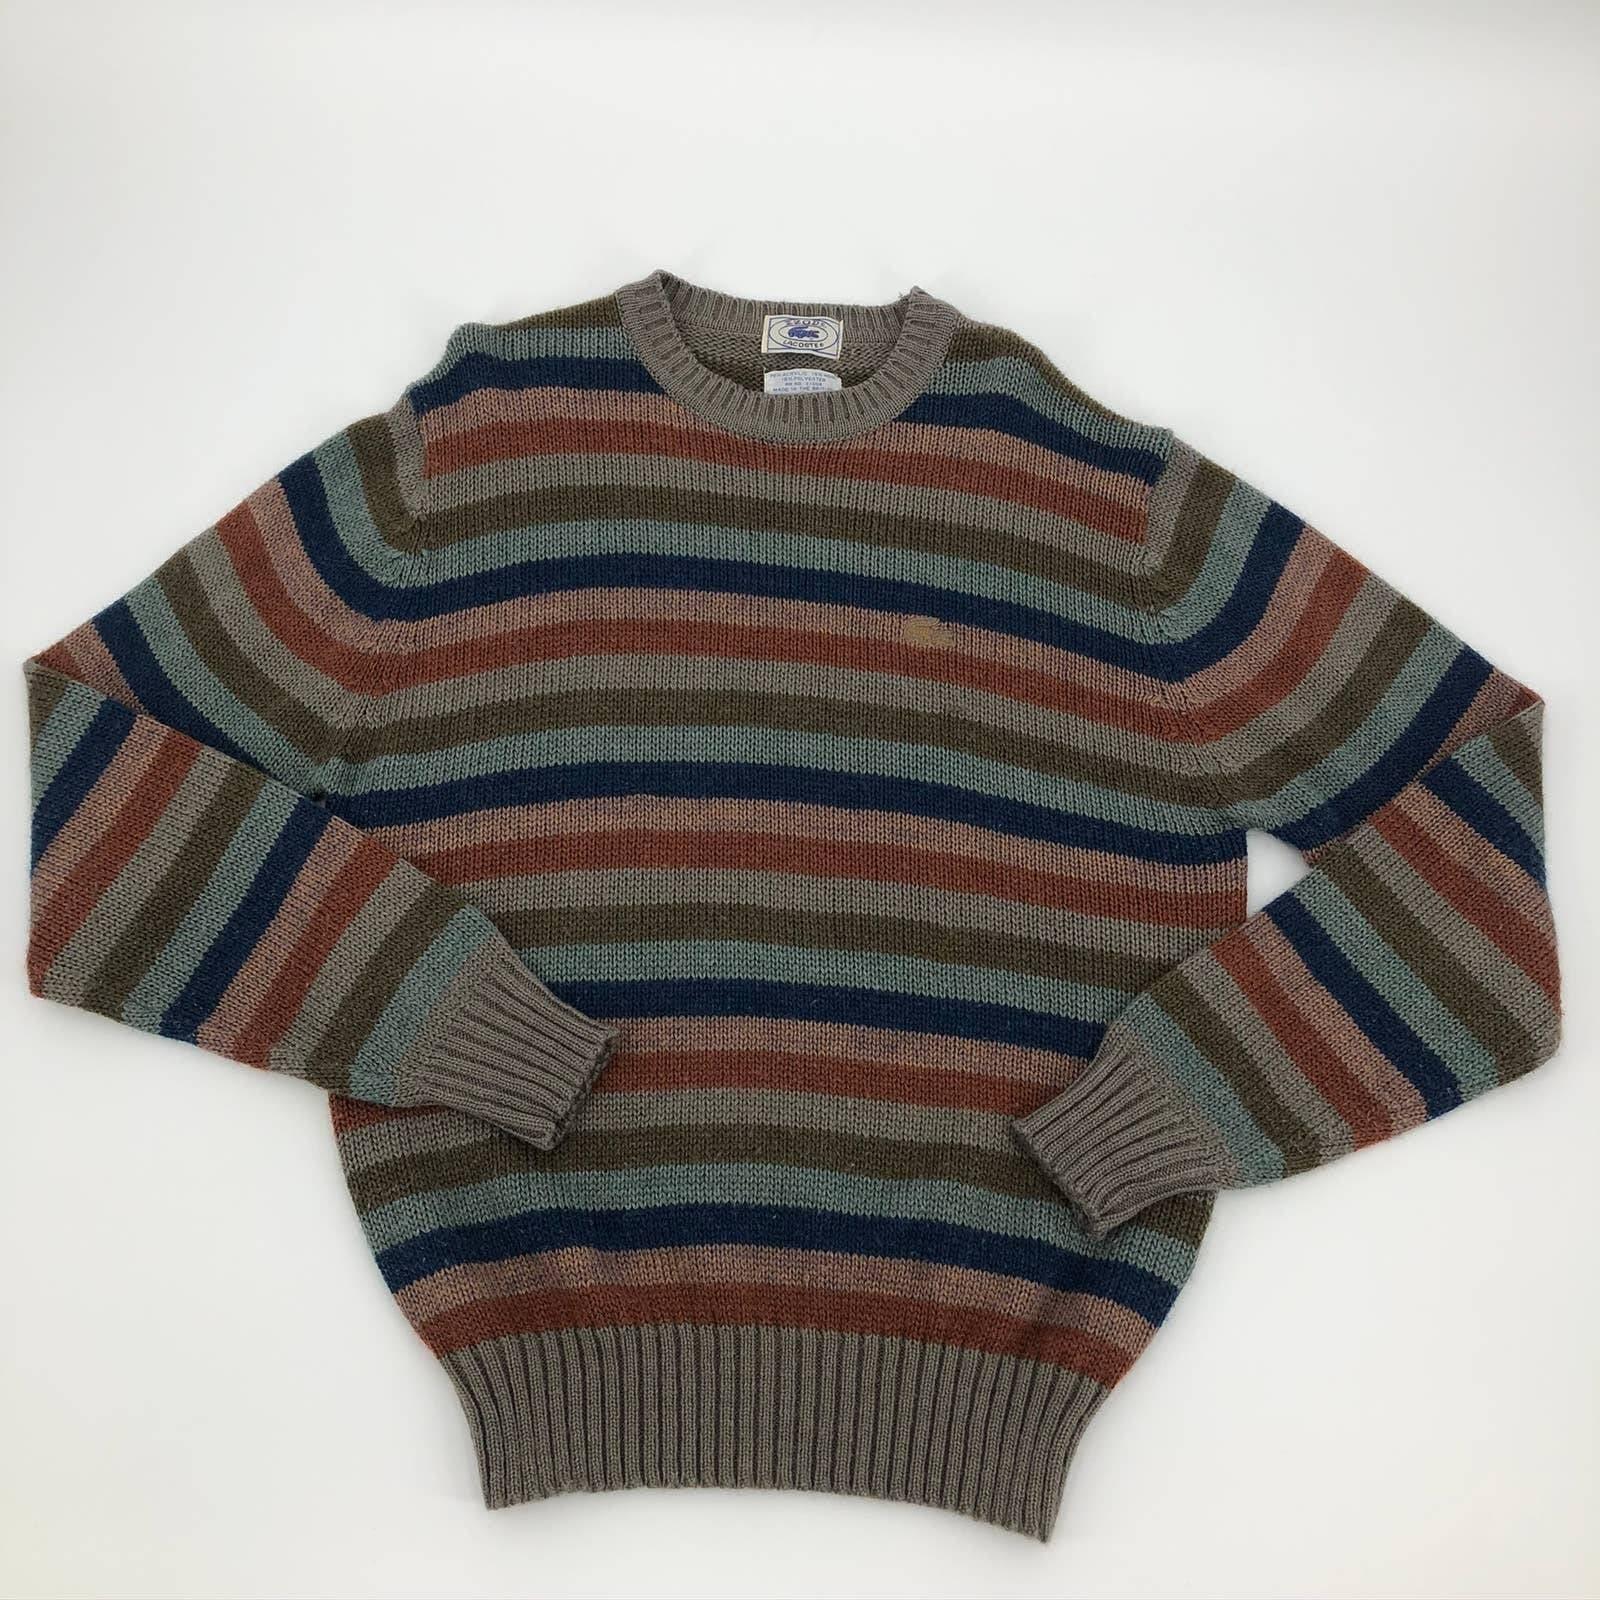 Izod Lacoste Large Mens Sweater Wool